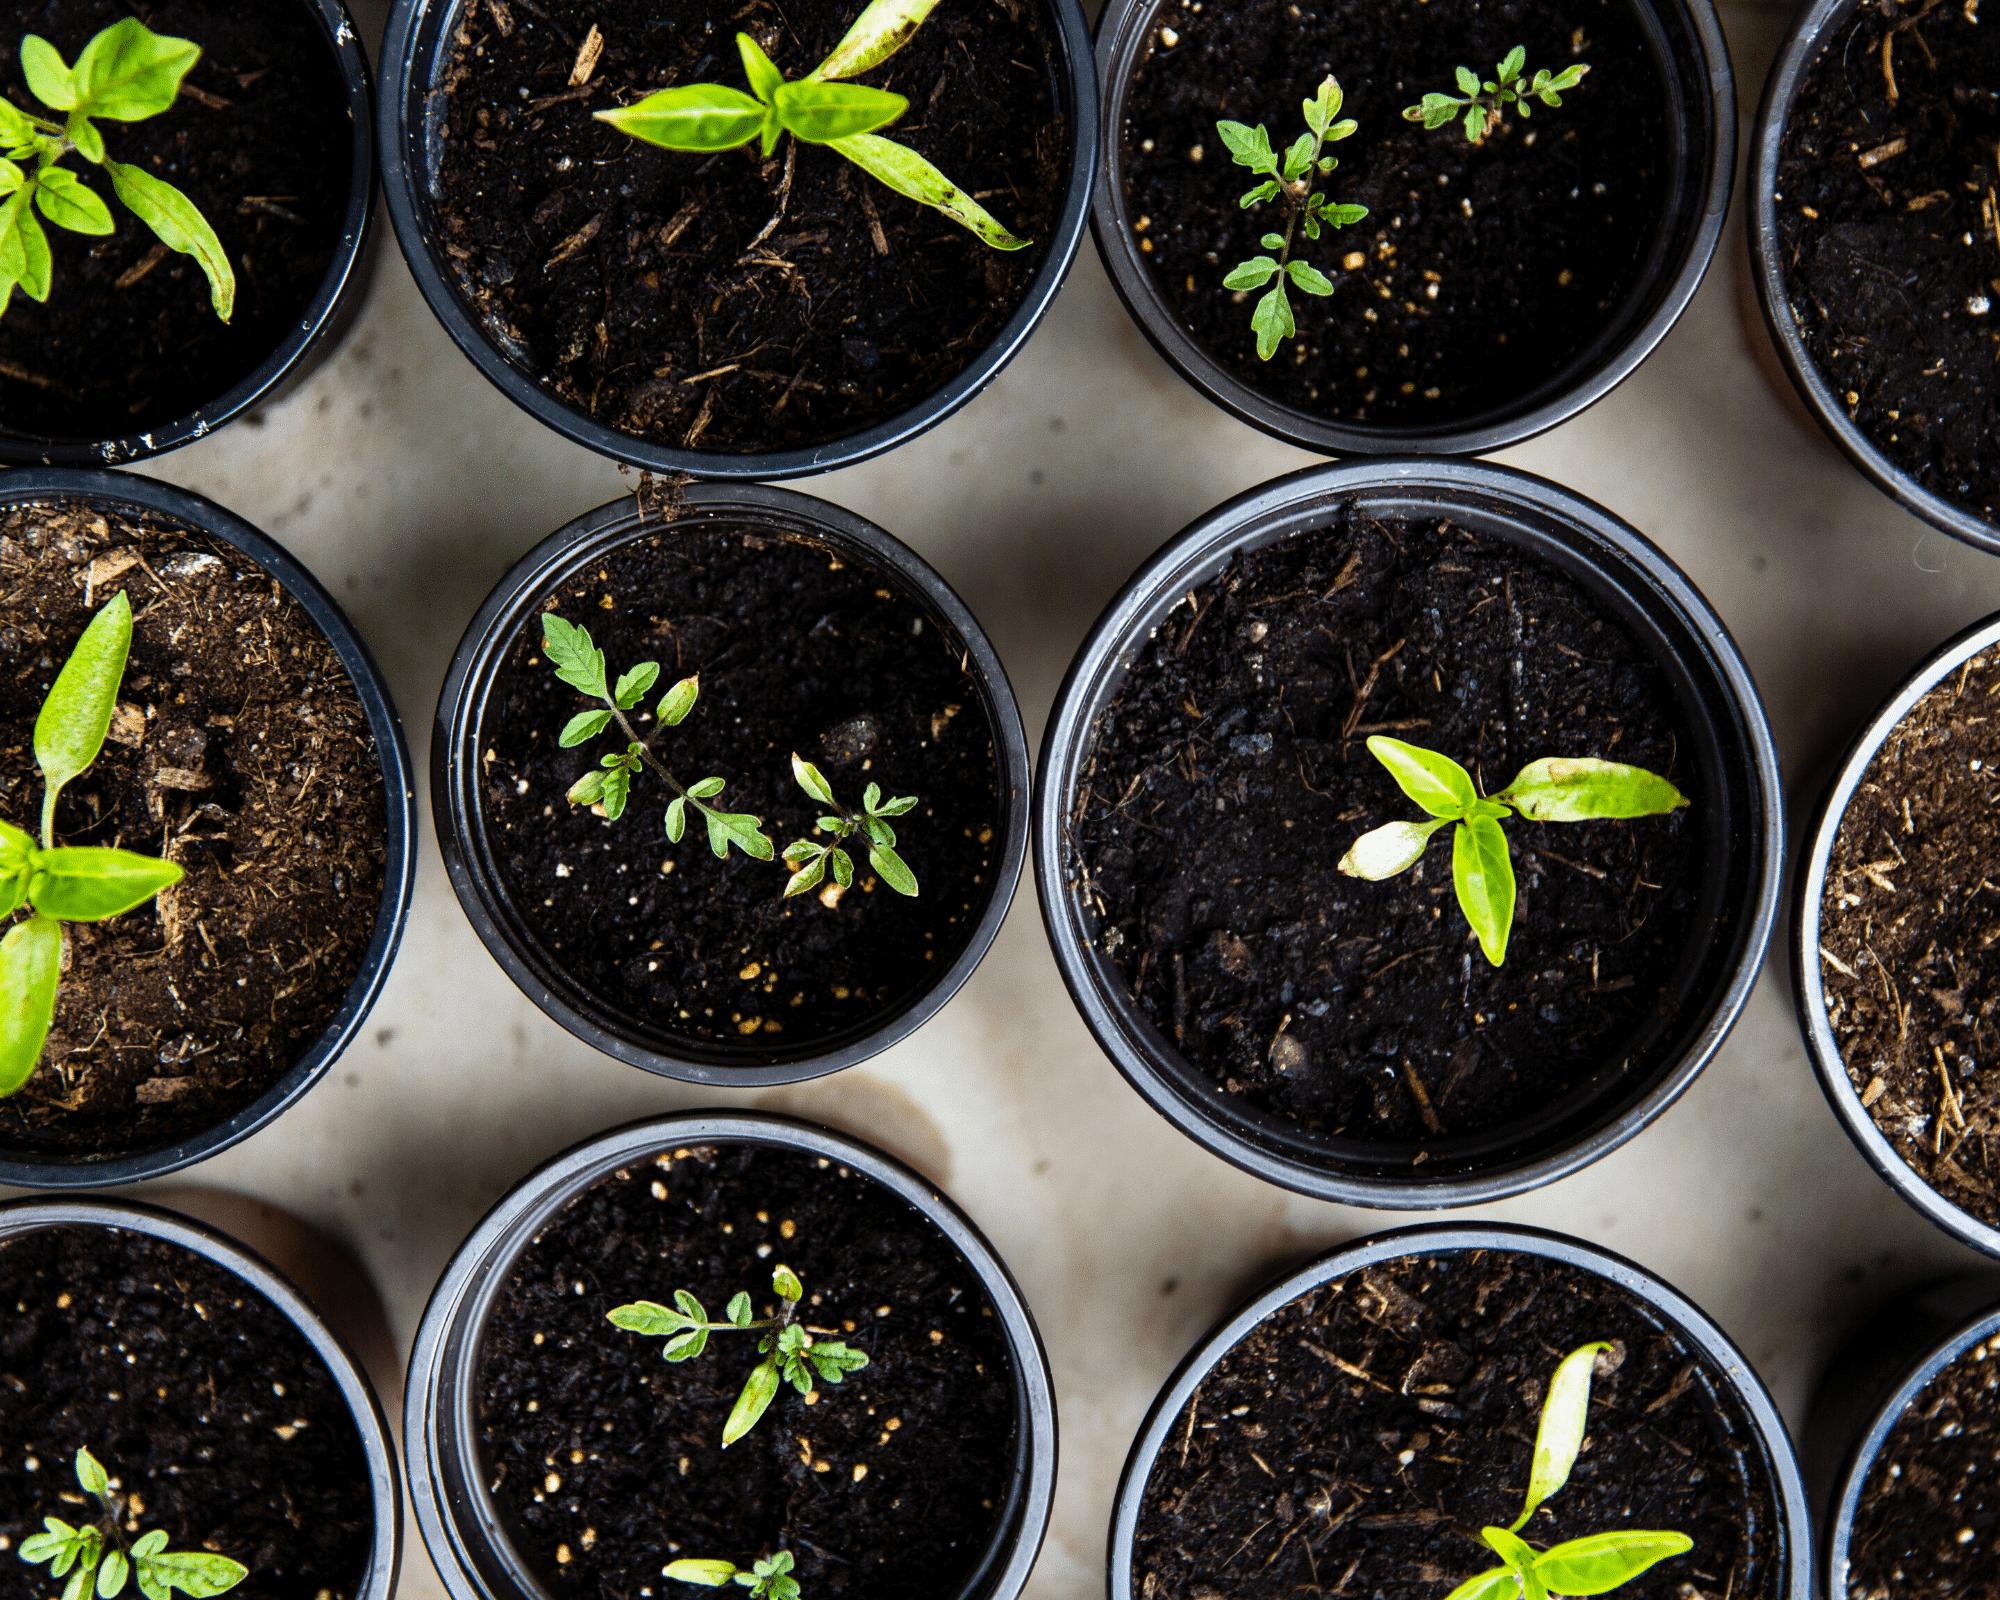 seedlings in soil in black pots - beginner's guide to gardening